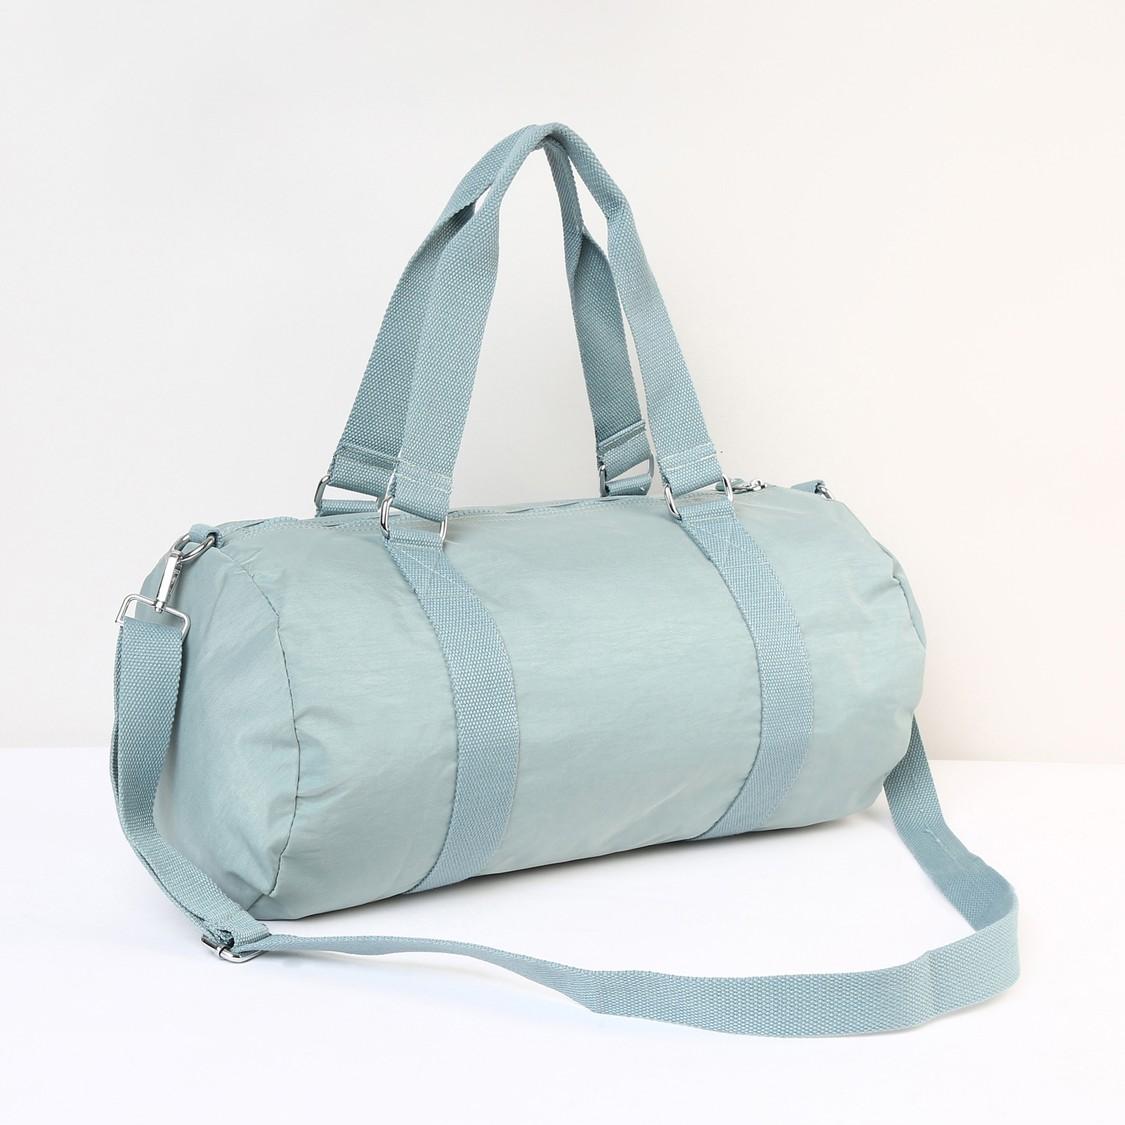 MAX Solid Duffle Bag